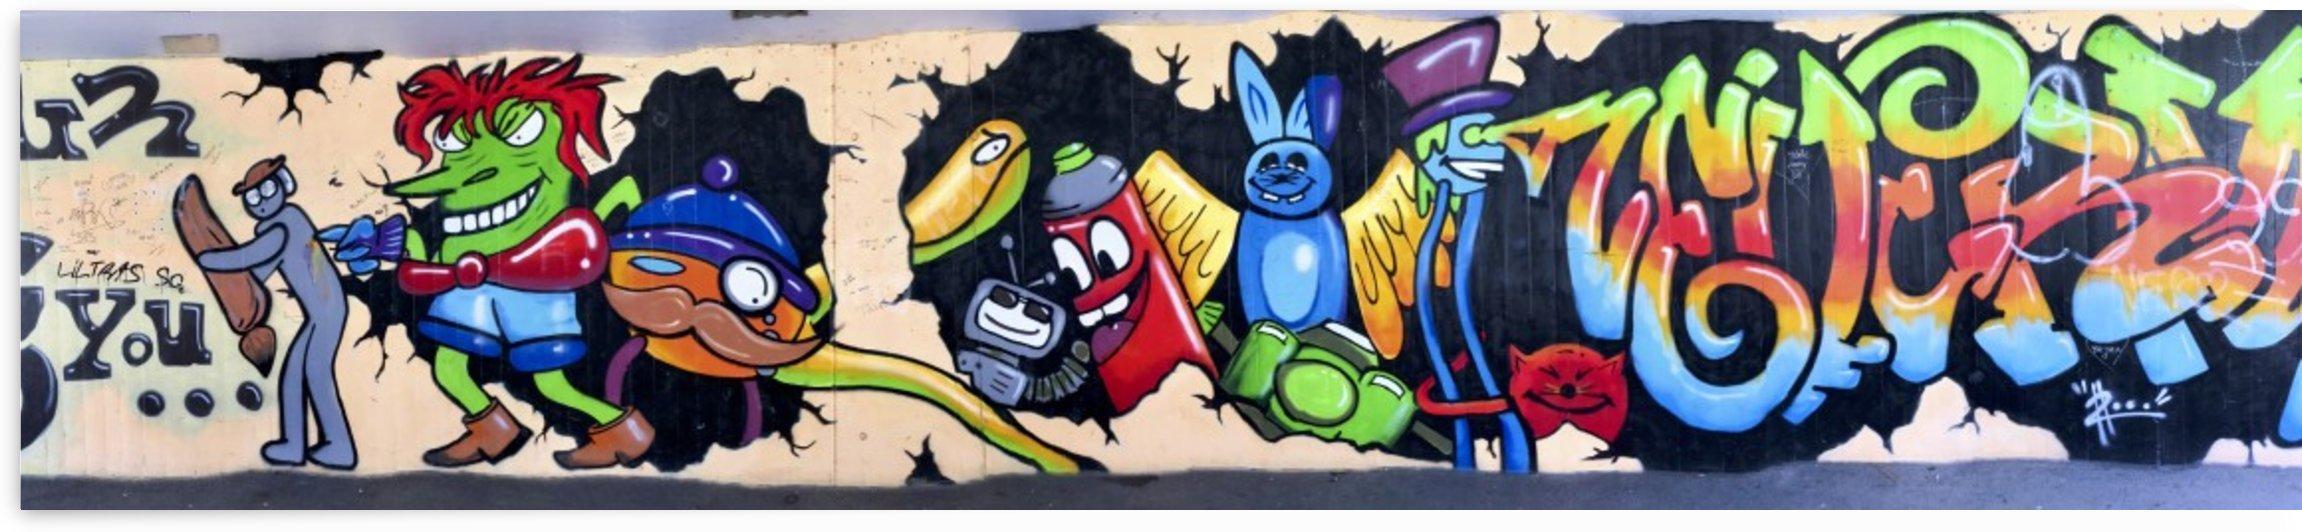 Underpass Creative Graffiti Art II by Swiss Art by Patrick Kobler